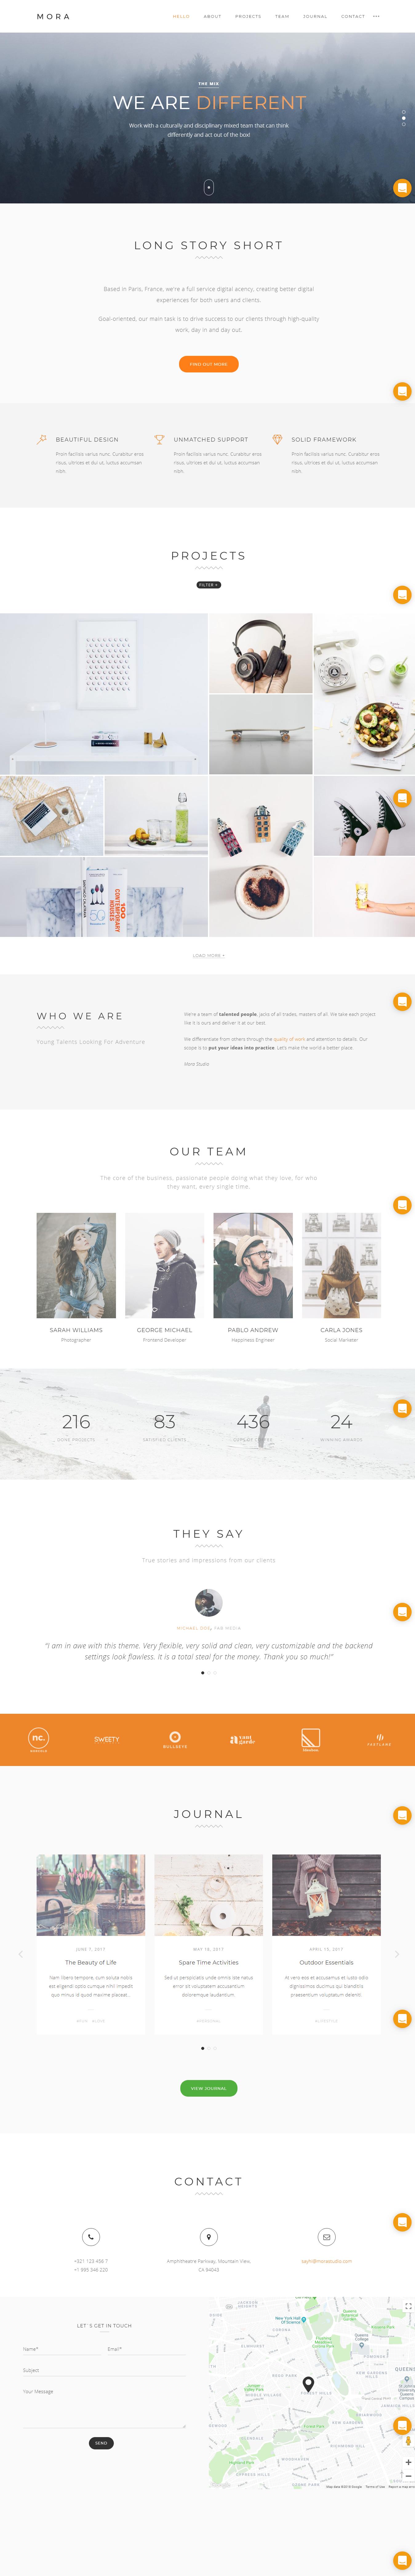 Mora - Premium Photography WordPress Themes and Templates